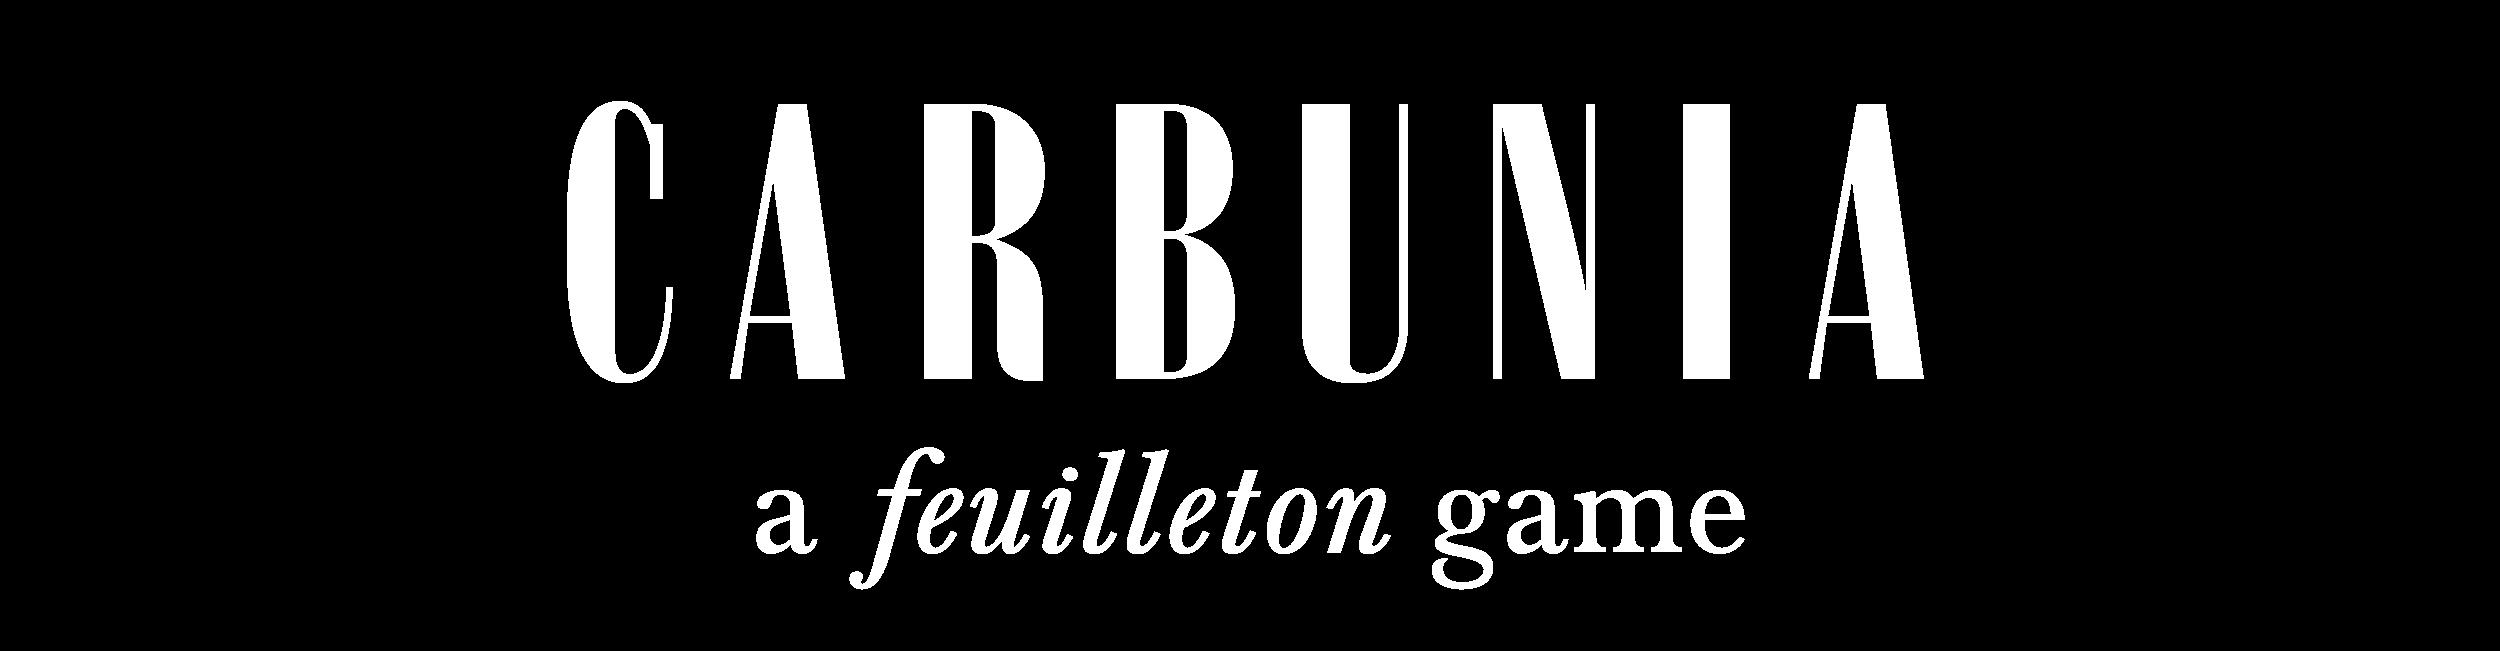 Carbunia